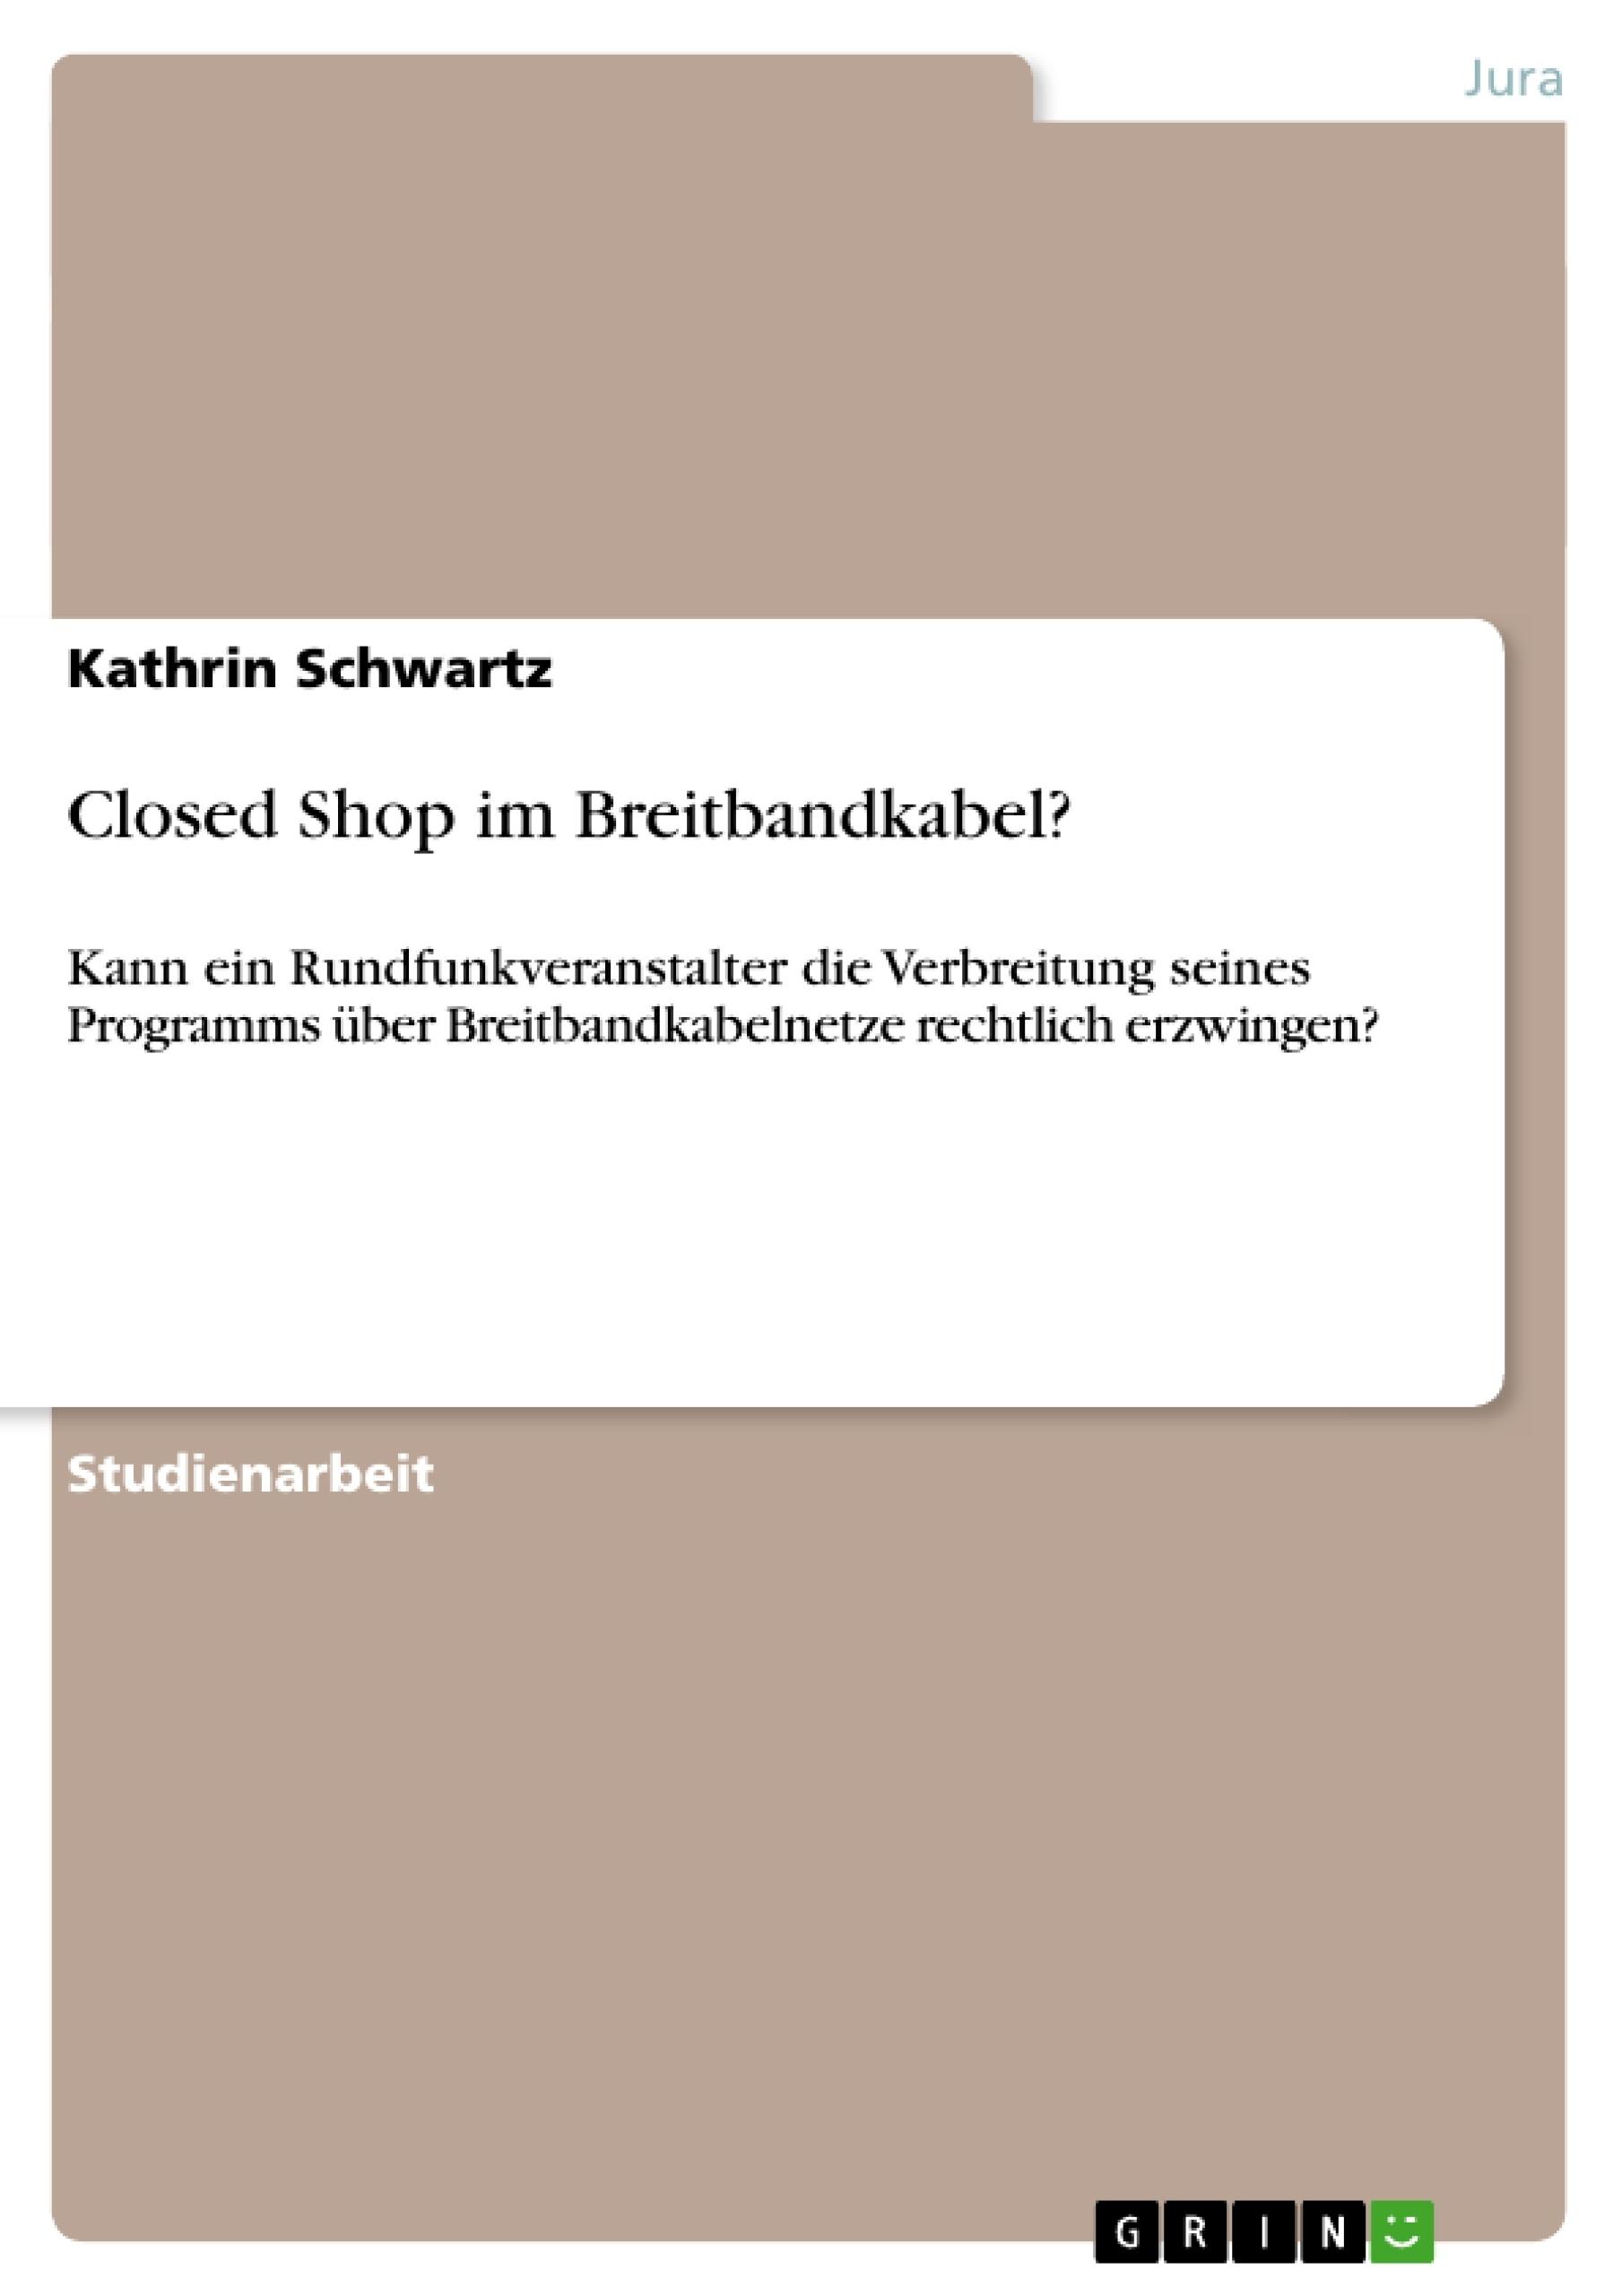 Titel: Closed Shop im Breitbandkabel?